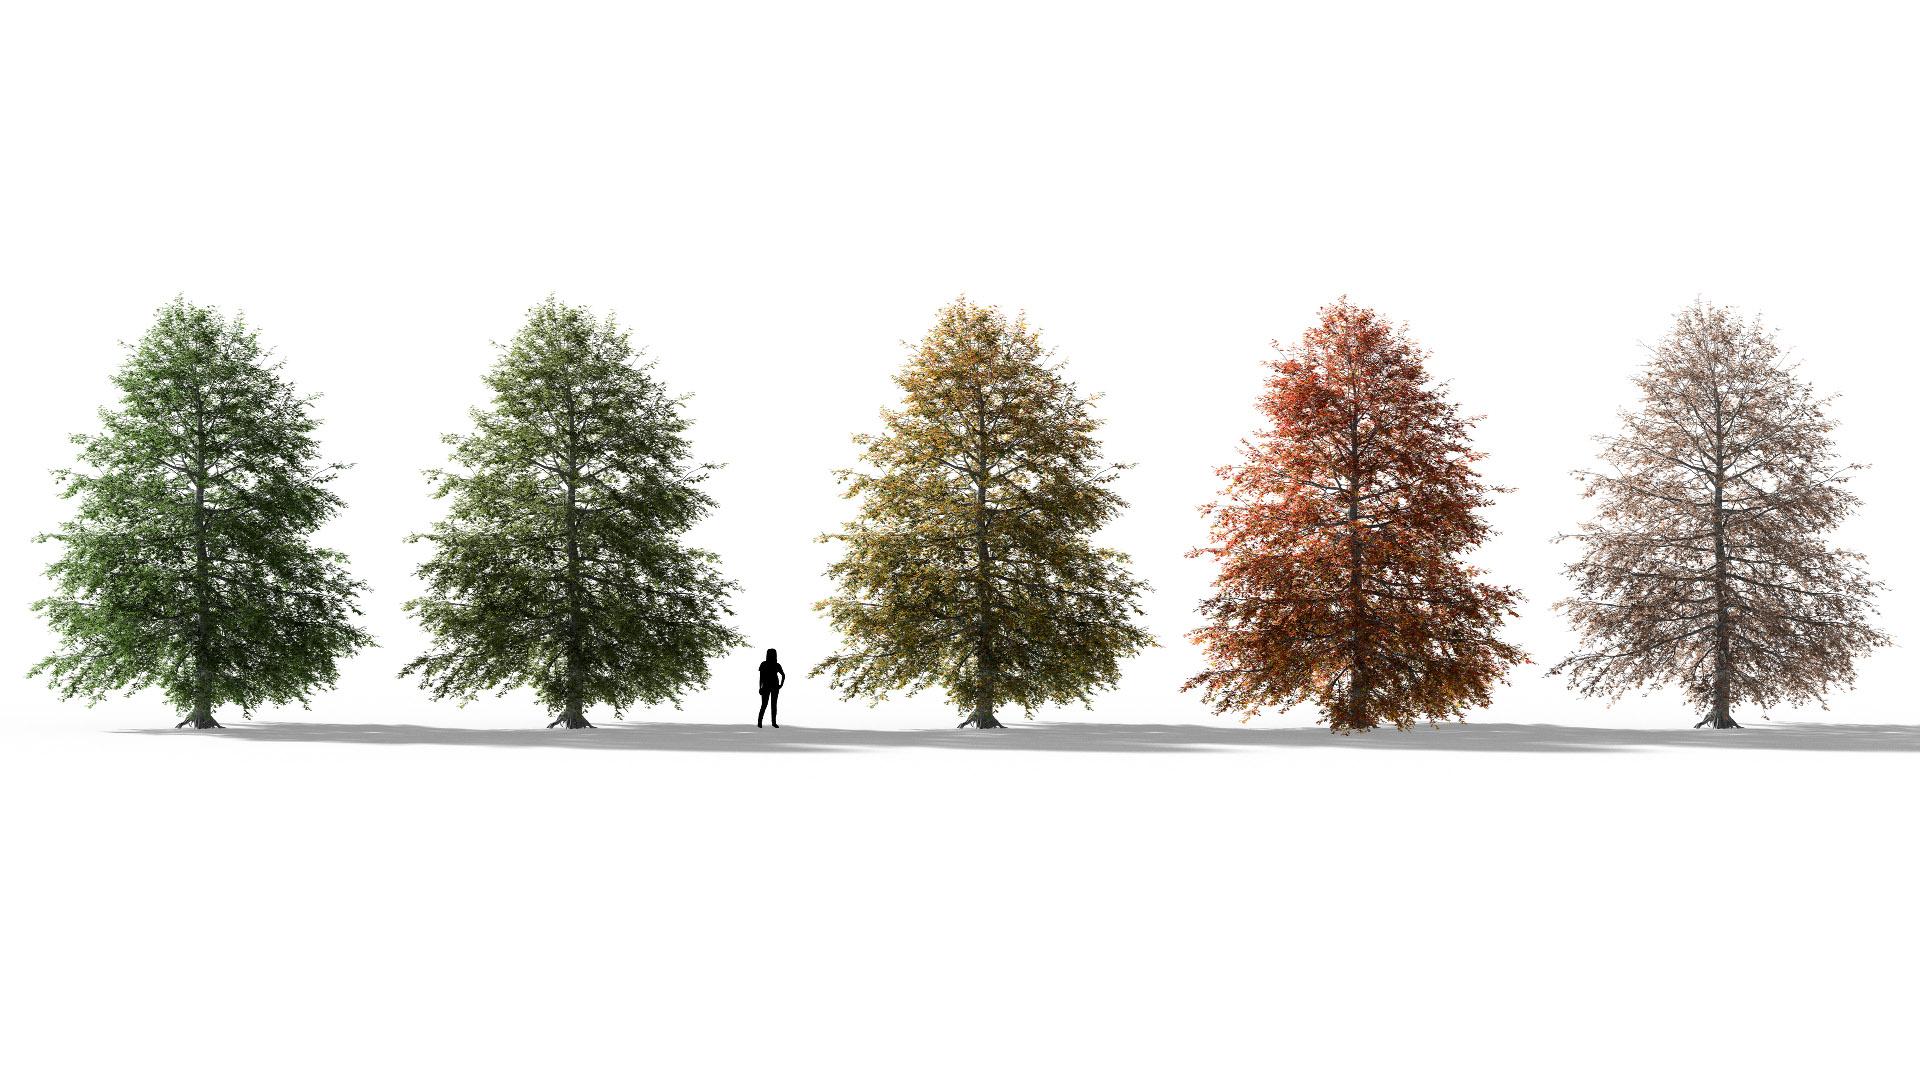 3D model of the Swamp oak Quercus palustris season variations